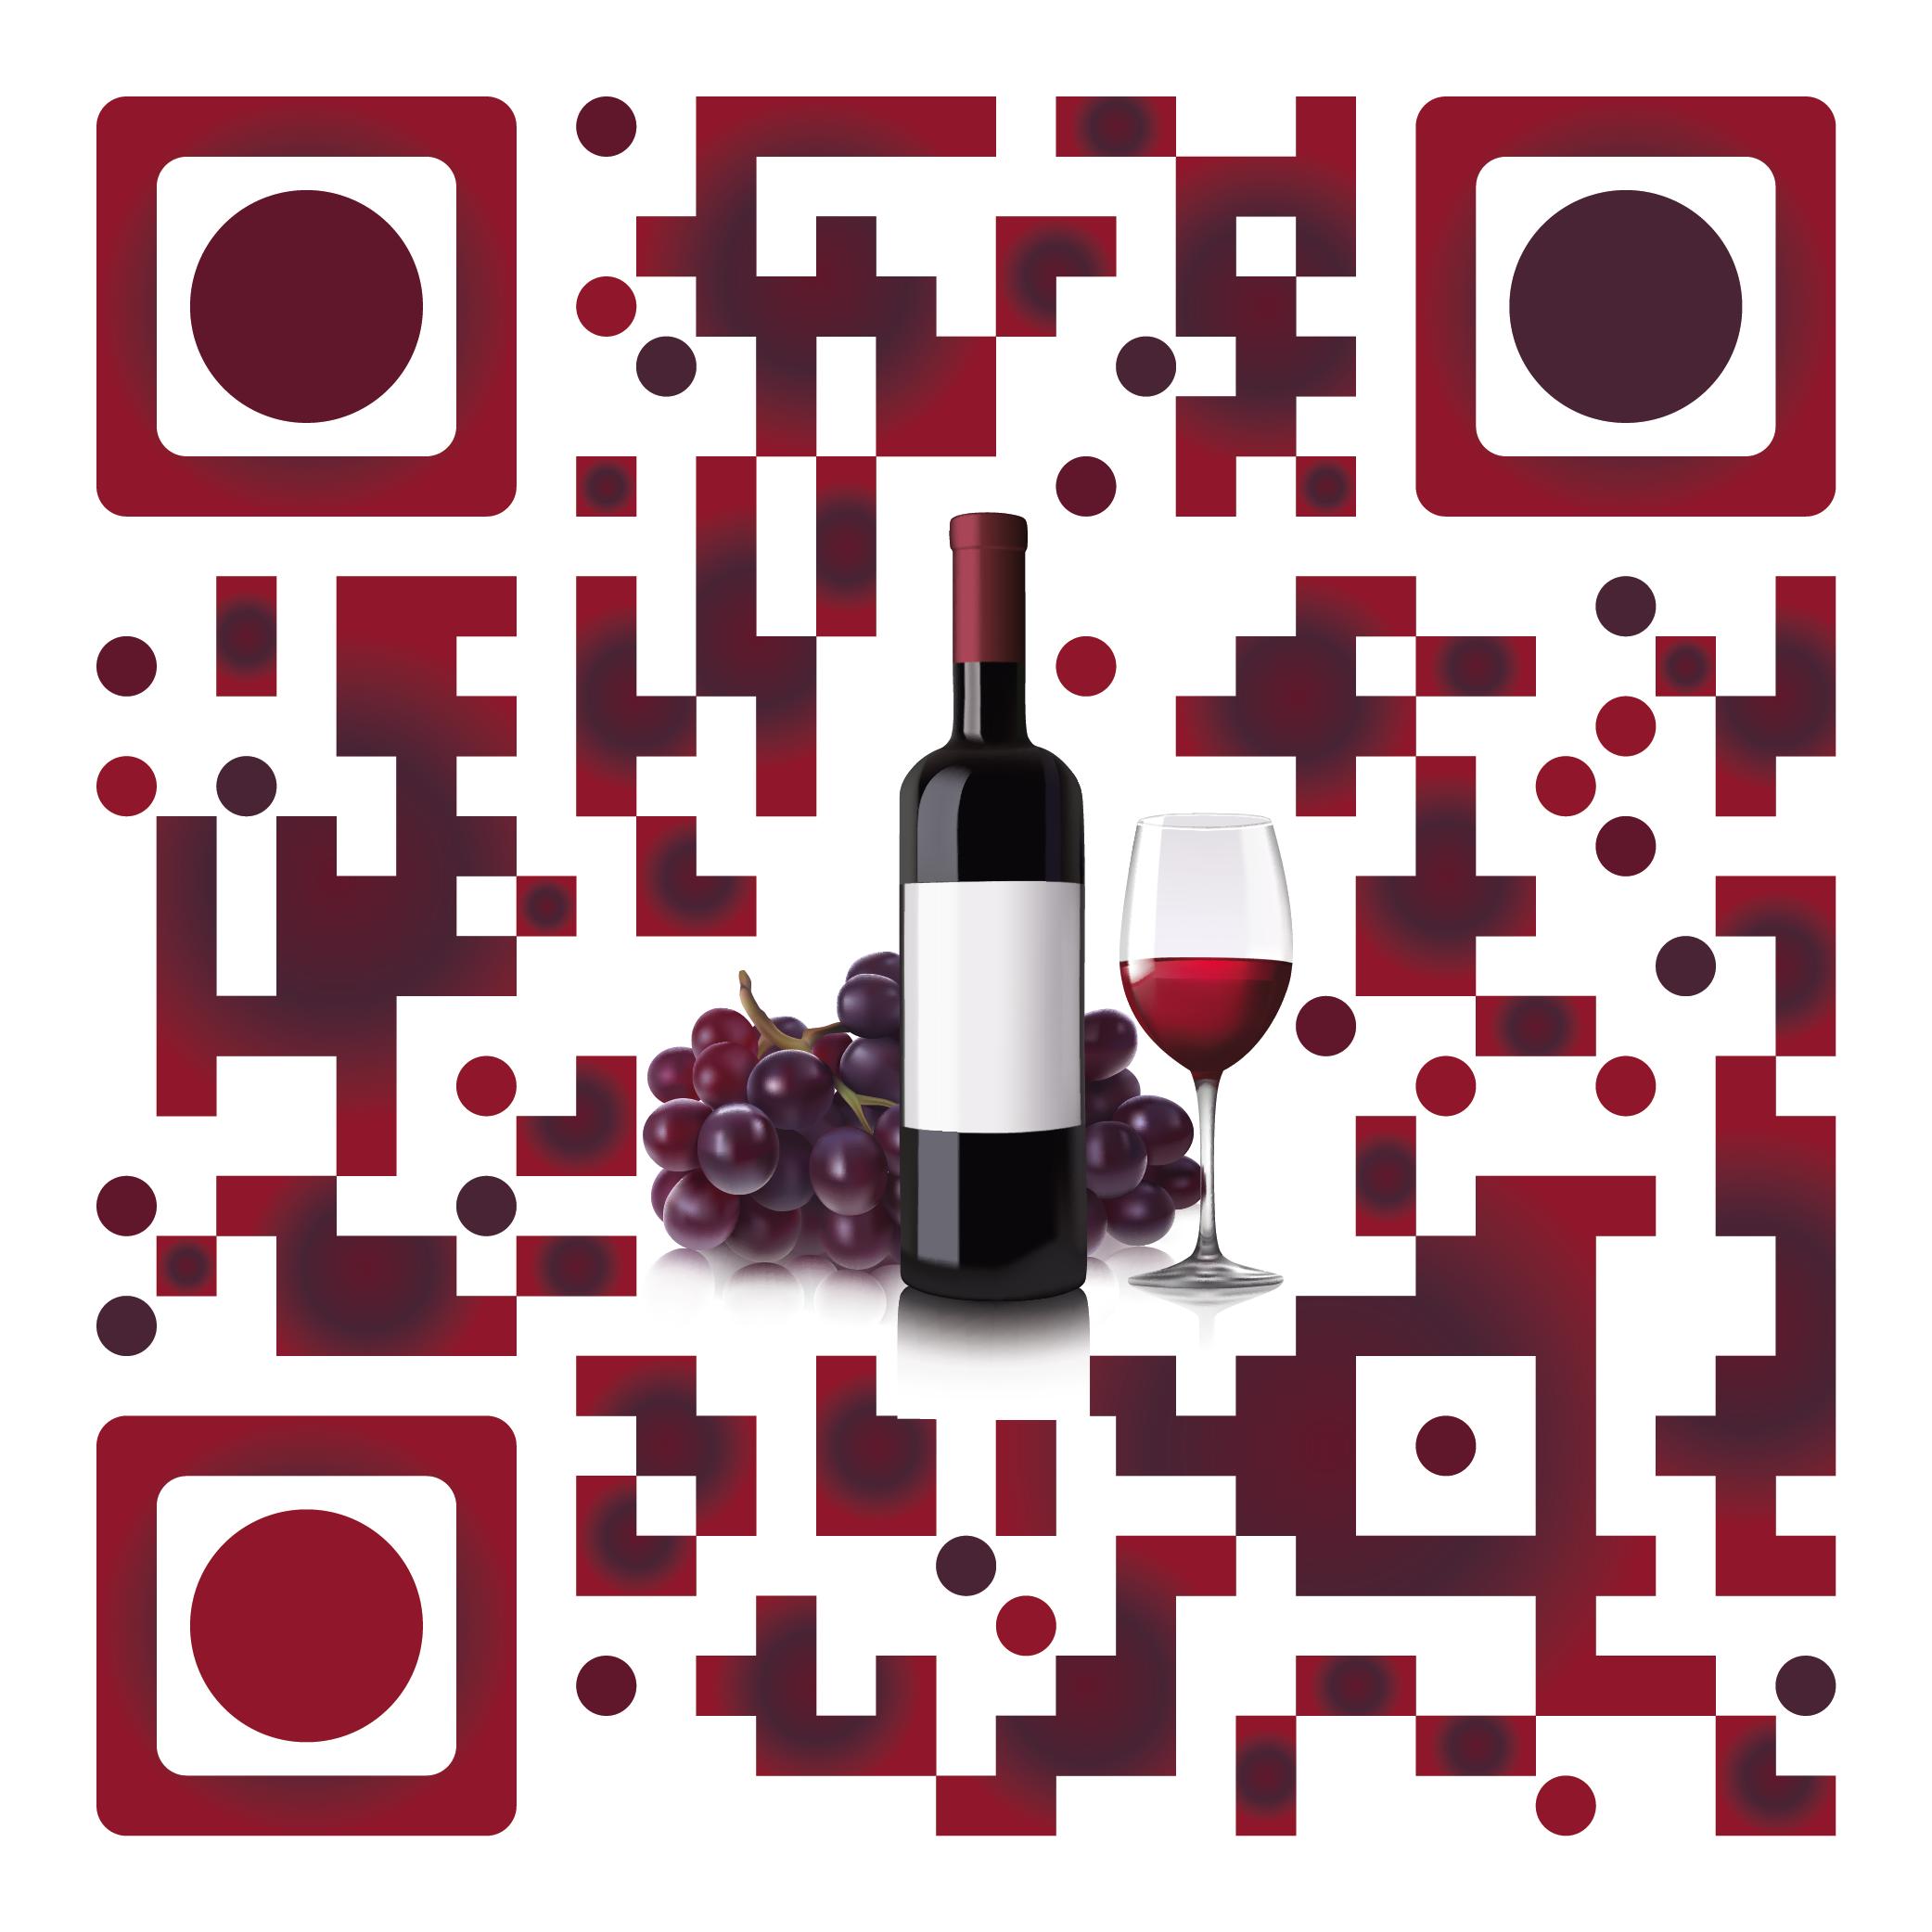 QR-Code-Generator | WeinKommunikatoren